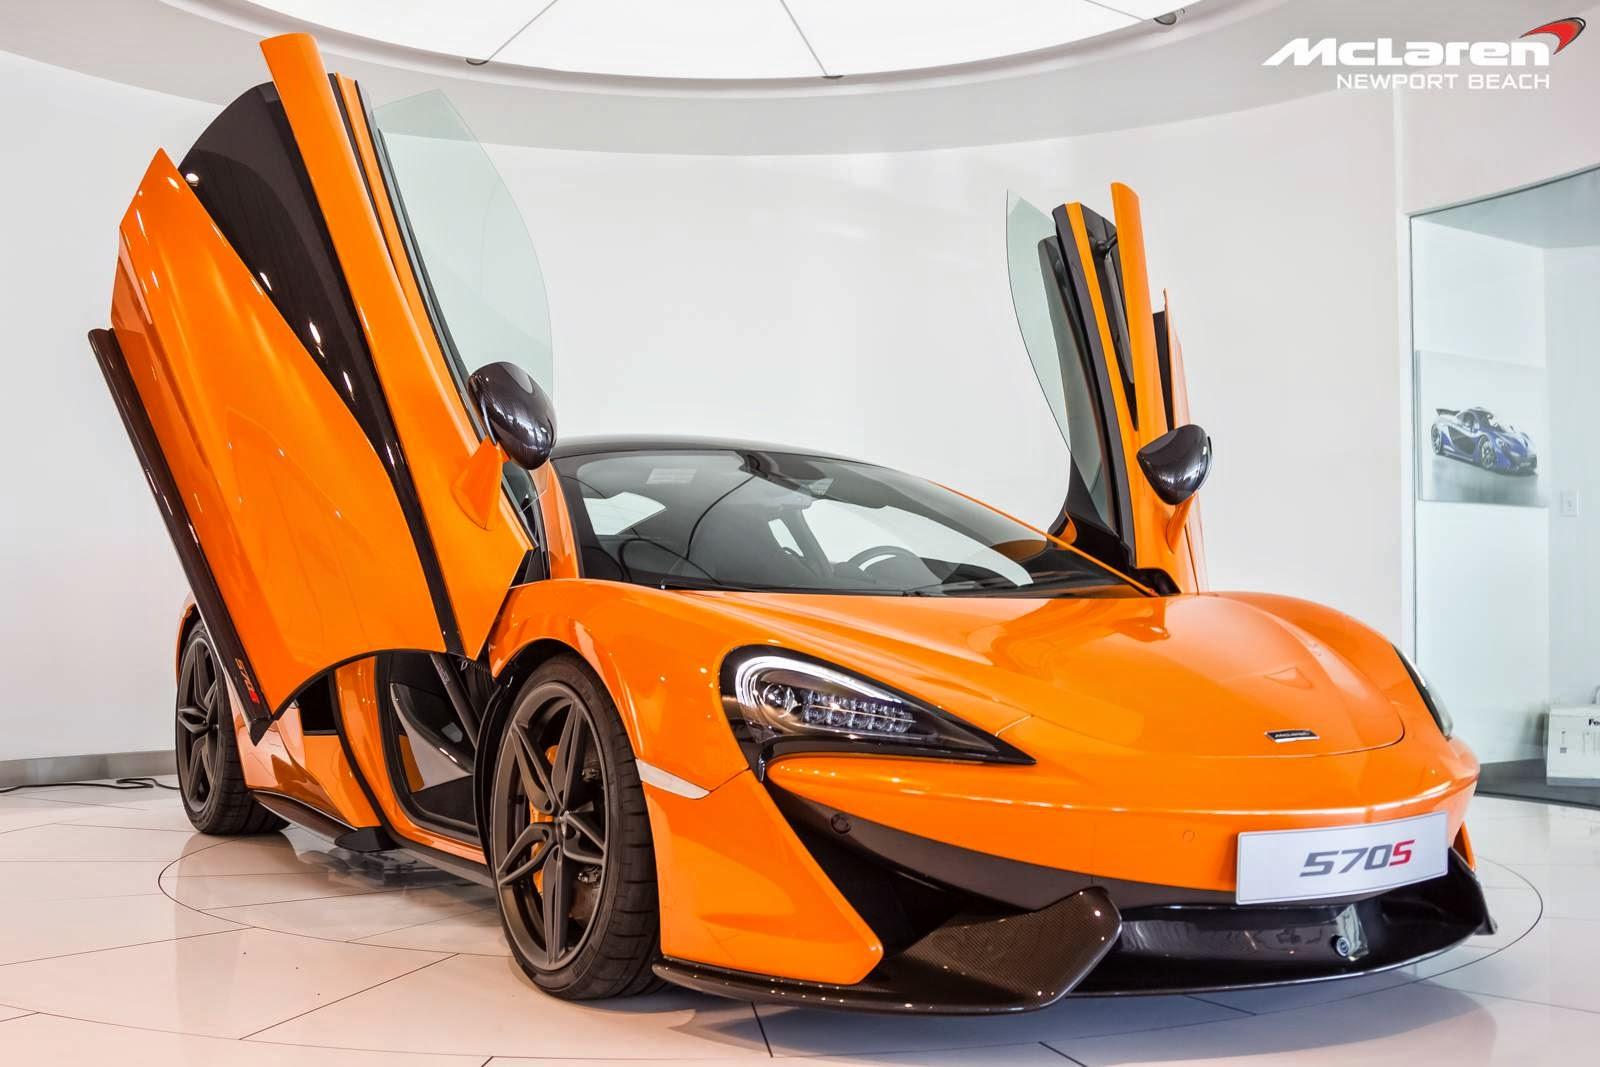 mclaren 570s price - car design today •